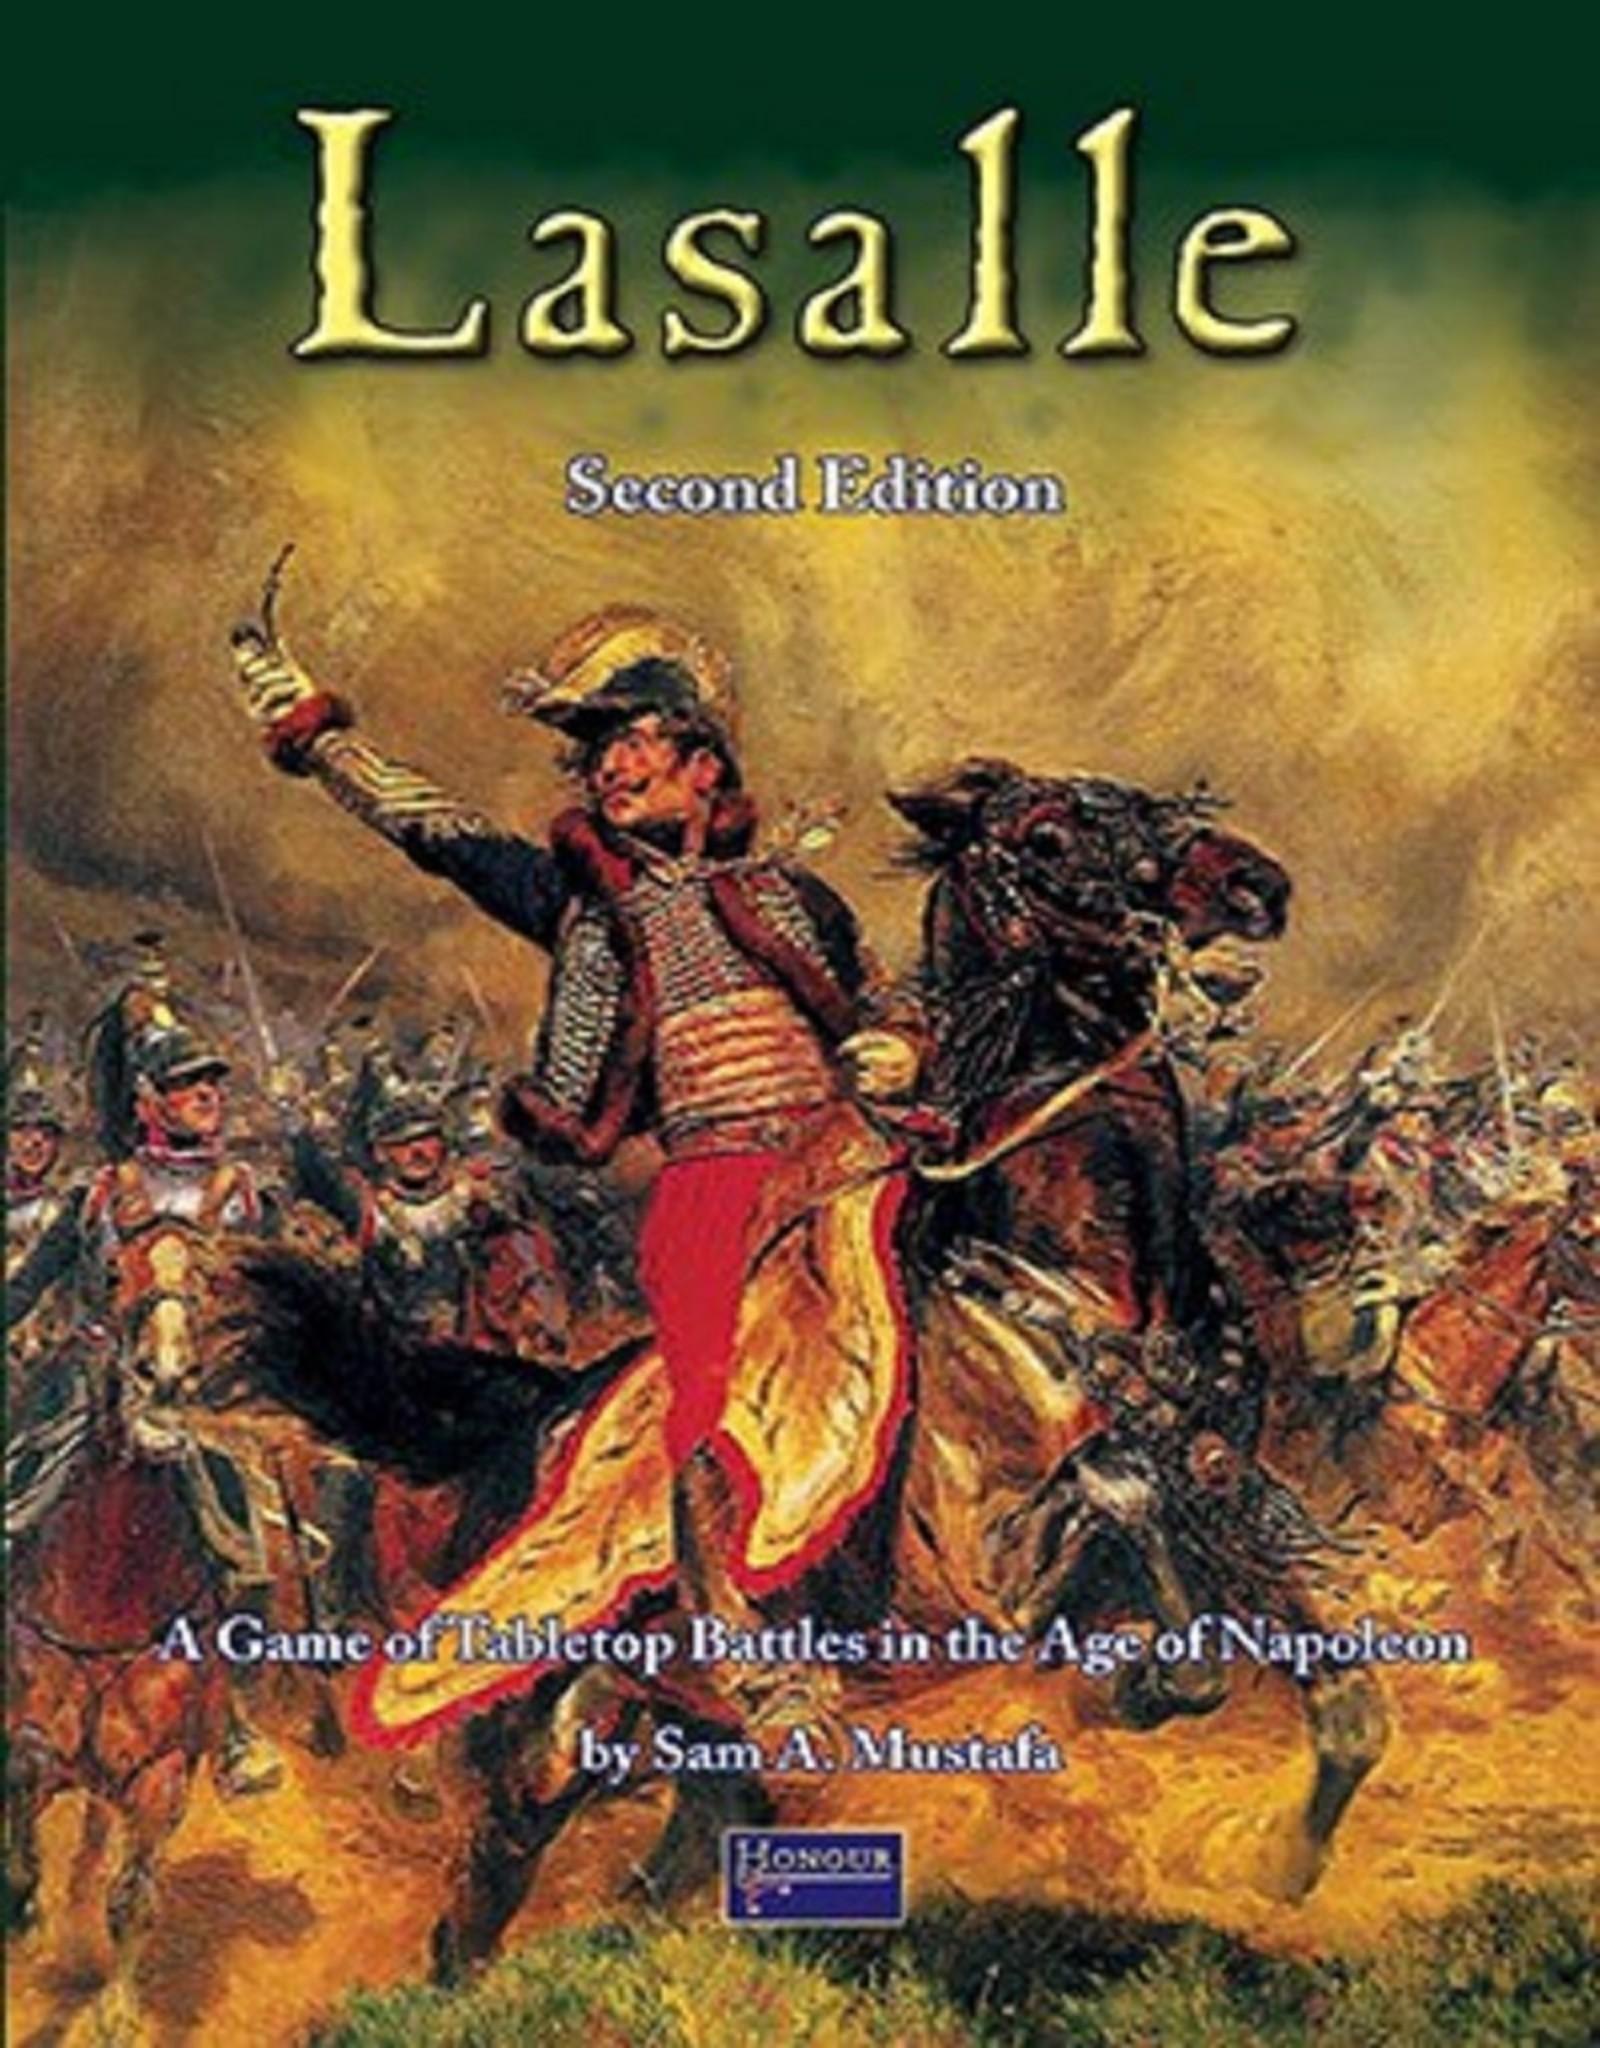 Honour Games (Sam Mustafa) Lasalle, 2nd Ed.